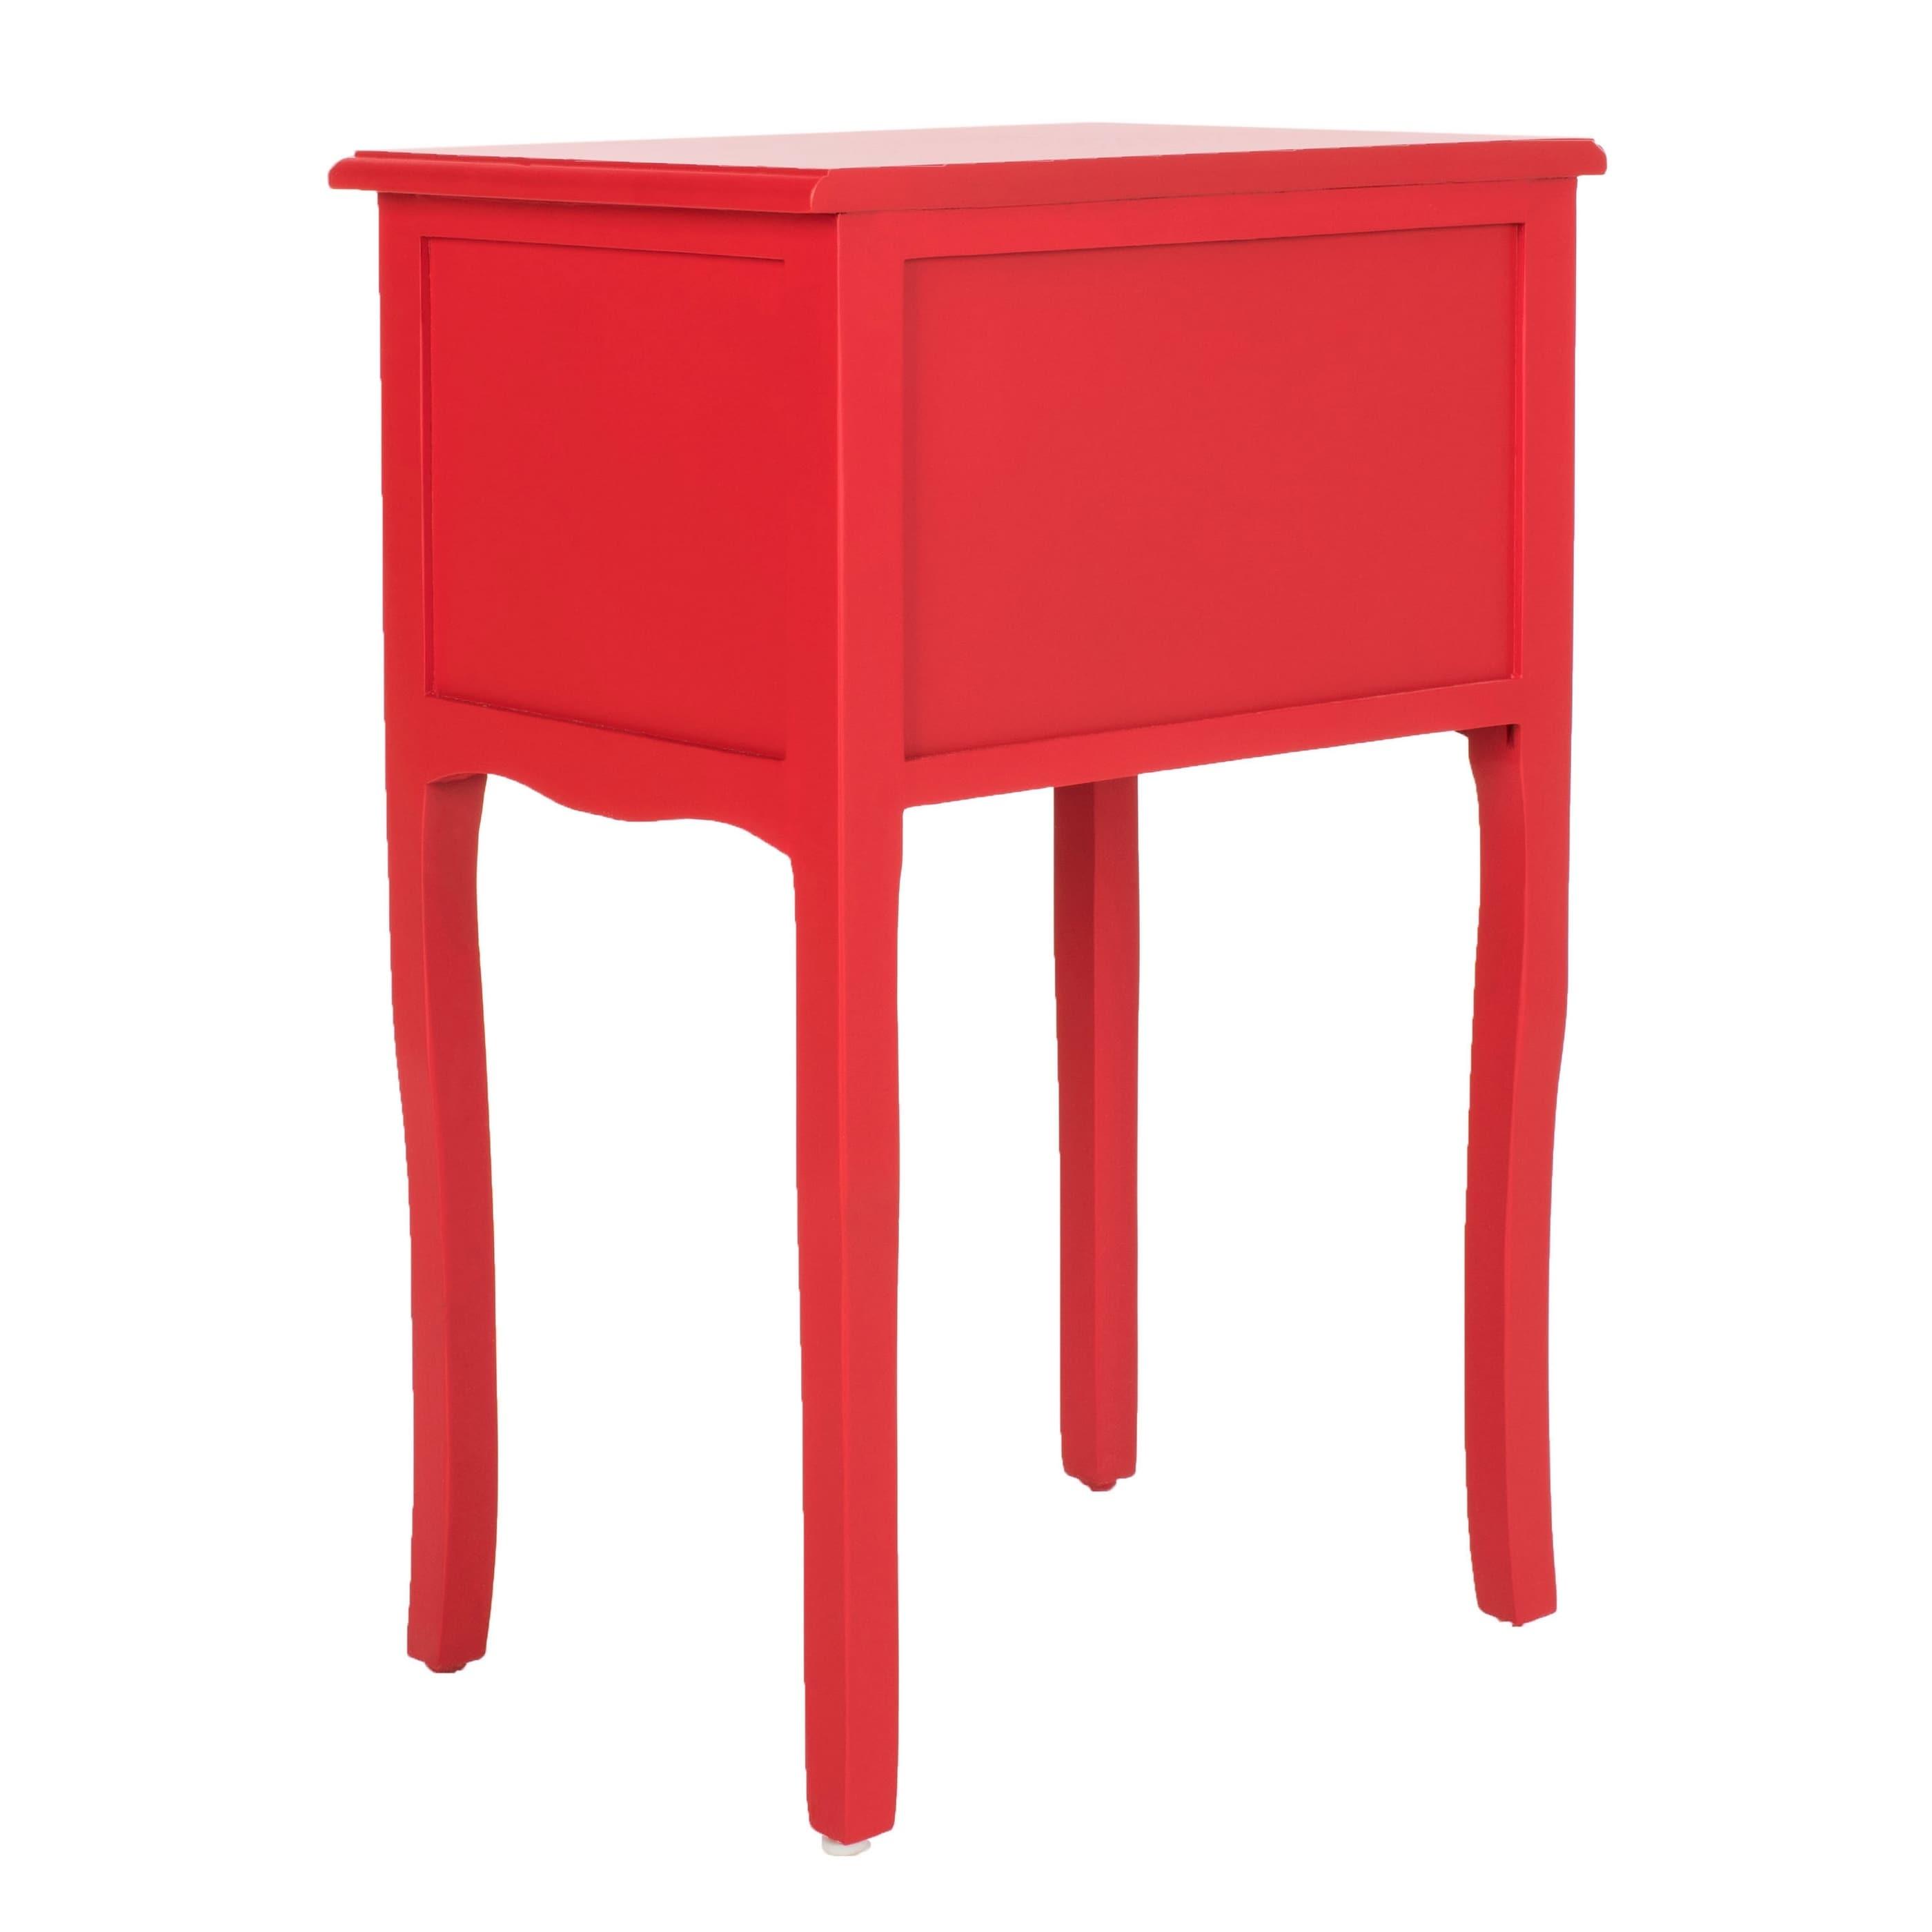 - Shop Safavieh Lori Red Accent Table - 18.1